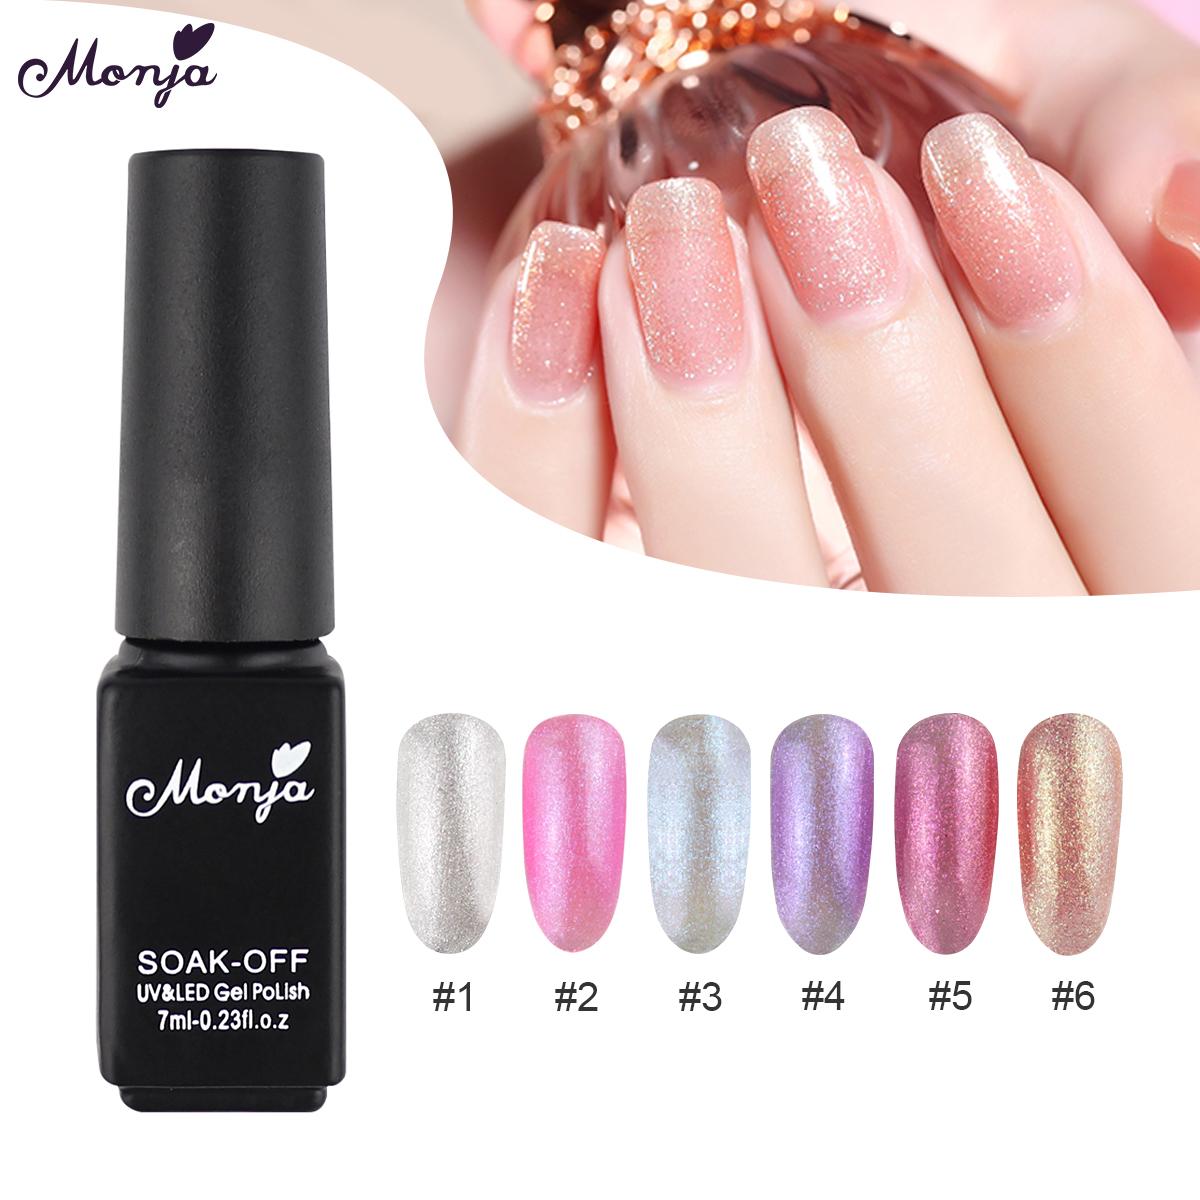 Monja 7ml Nail Semi Permanent Long Lasting Shimmer Neon Polish Uv Gel Varnish Lacquer Vernis Manicure Tools 6 Colors Nail Gel Aliexpress